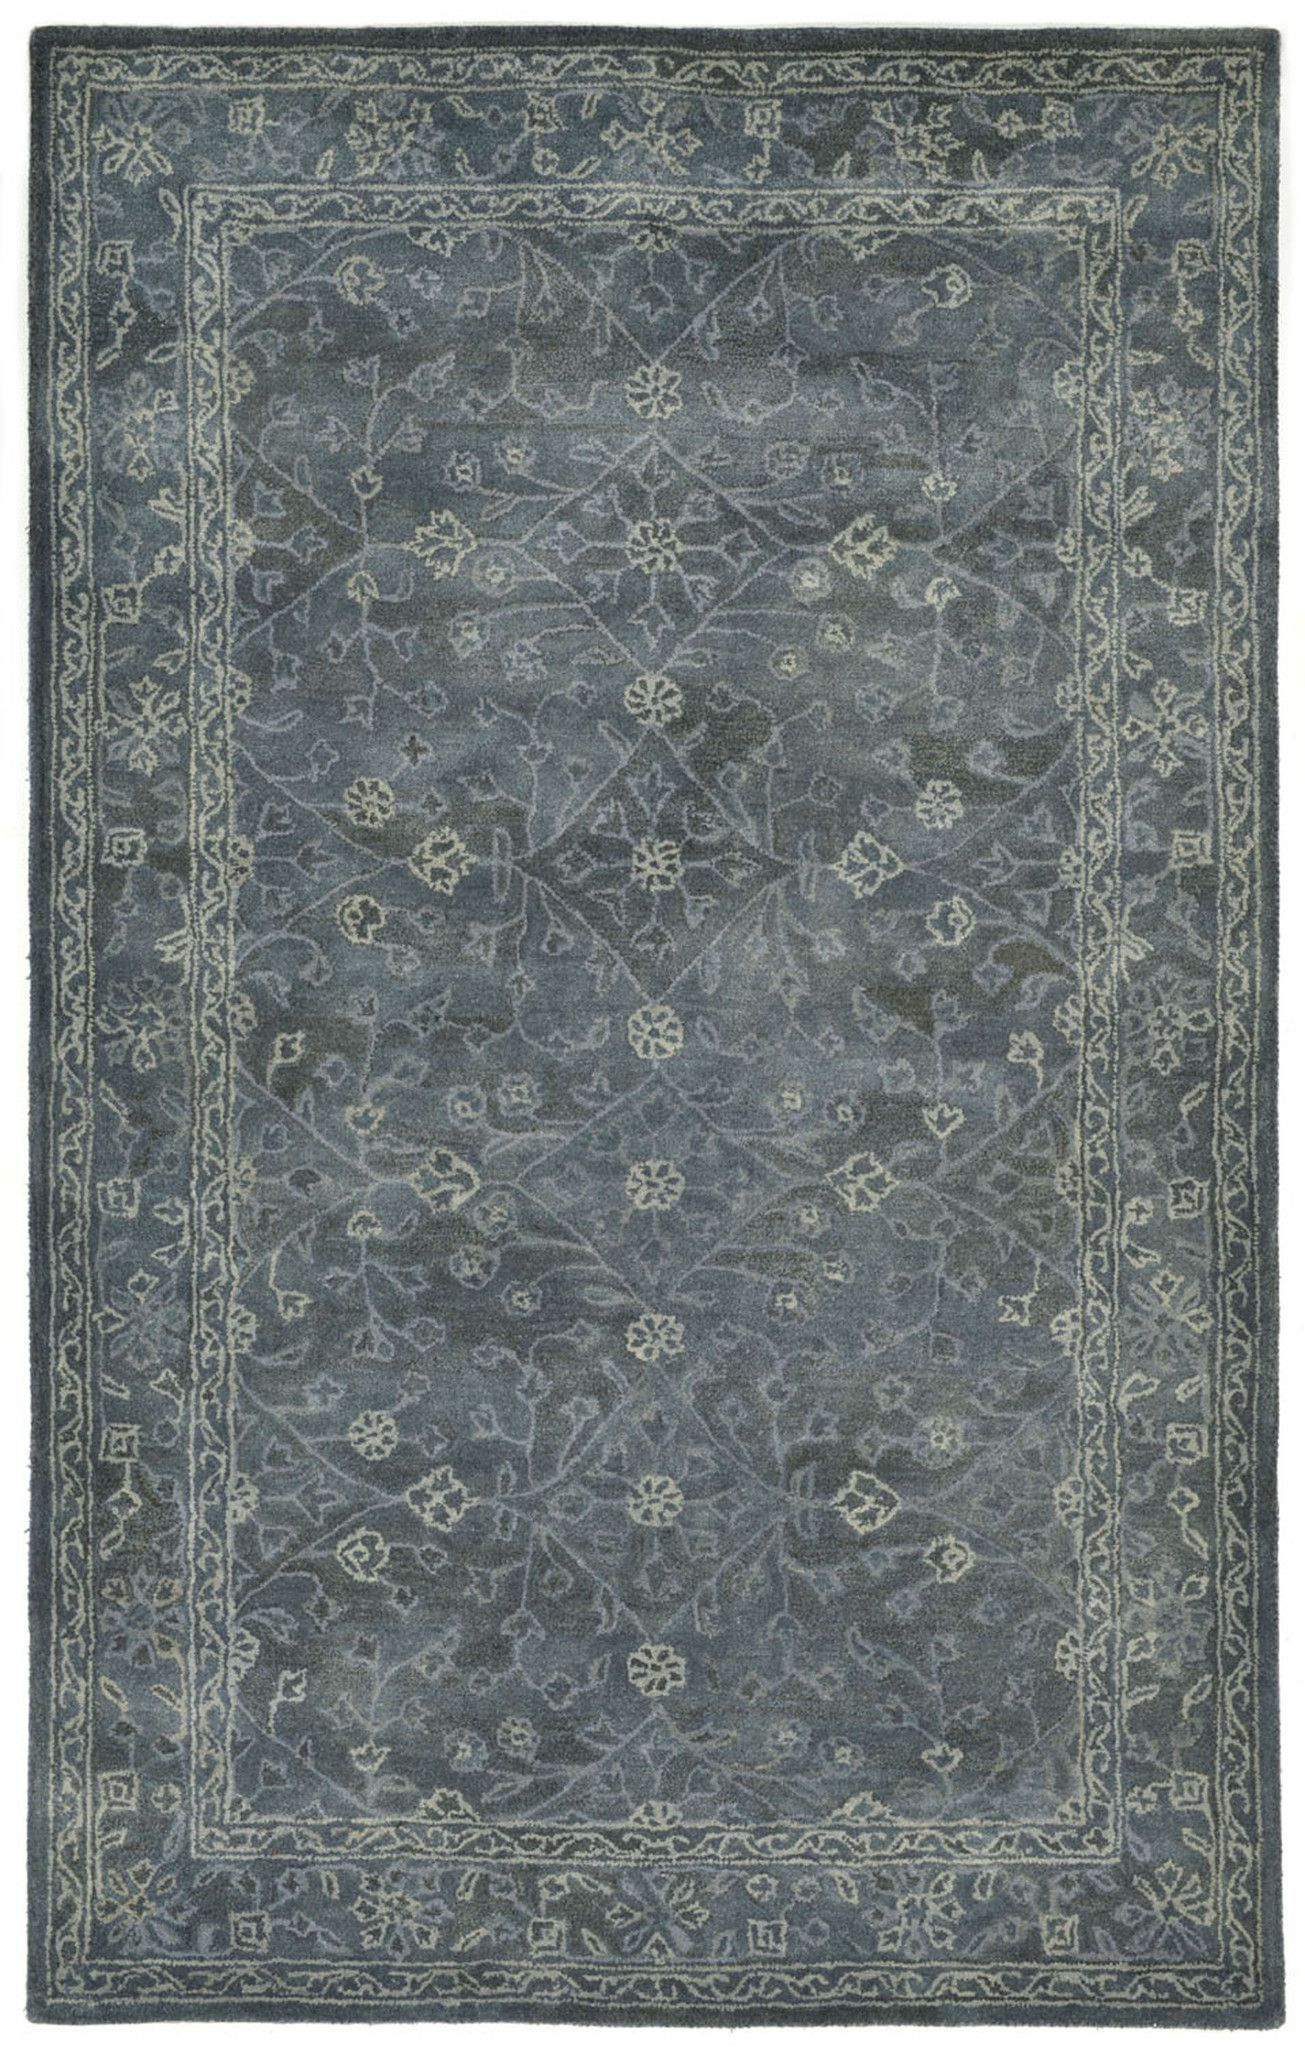 Goa amrita blue rug products pinterest goa